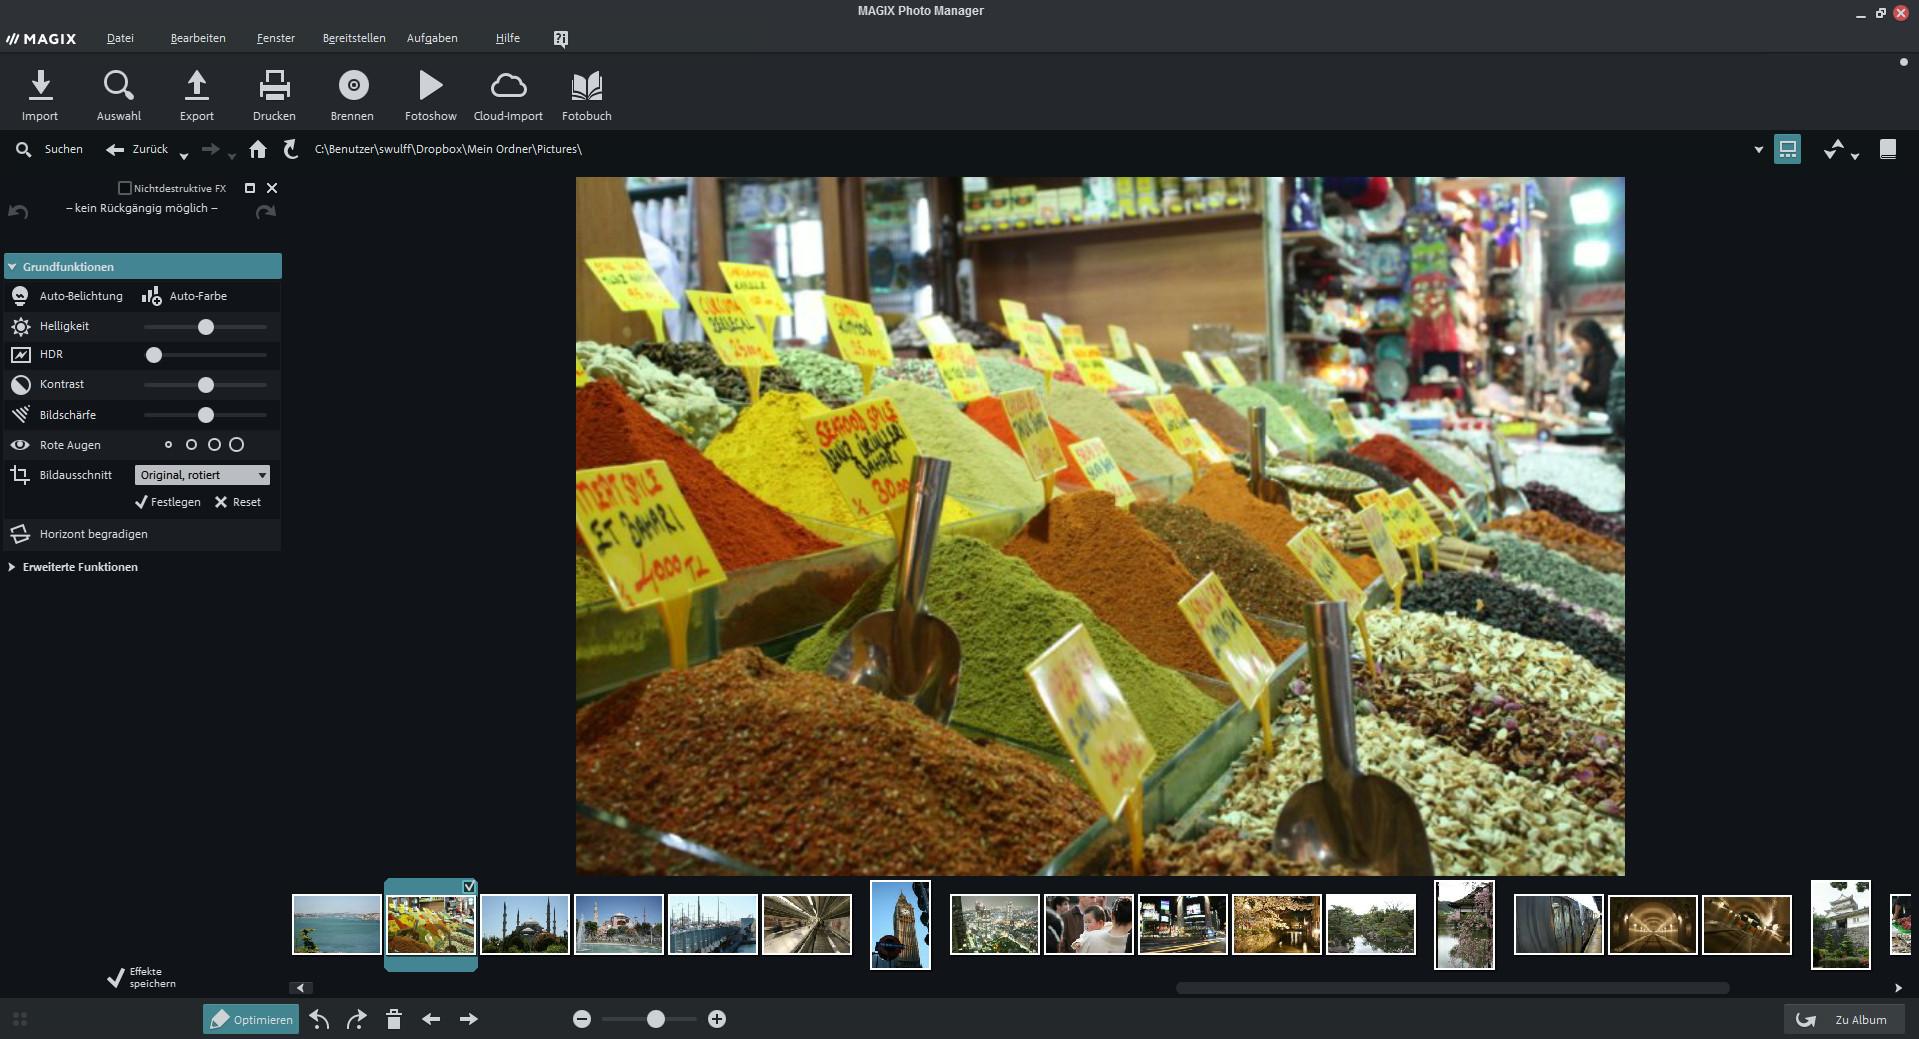 Screenshot 1 - Magix Photo Manager